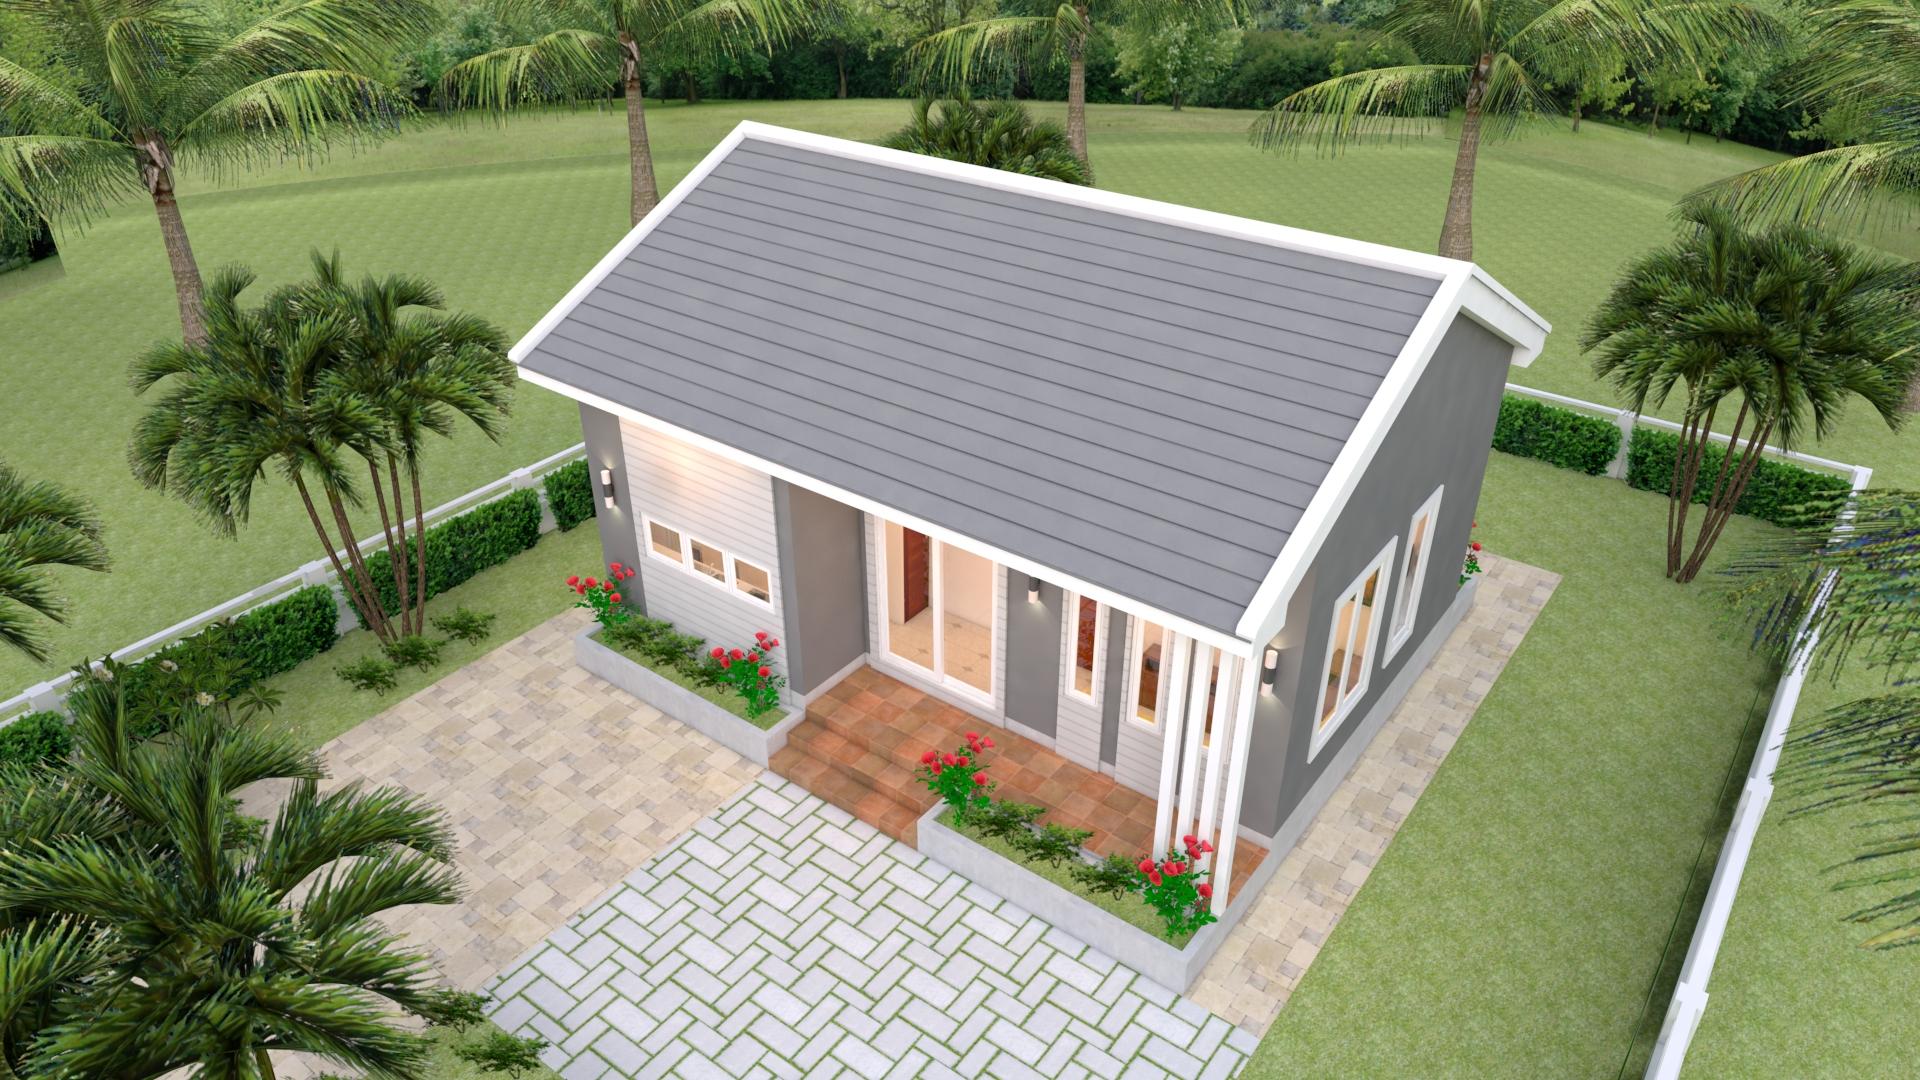 Small 2 Bedroom House 8x6 Meter 26x20 Feet 4